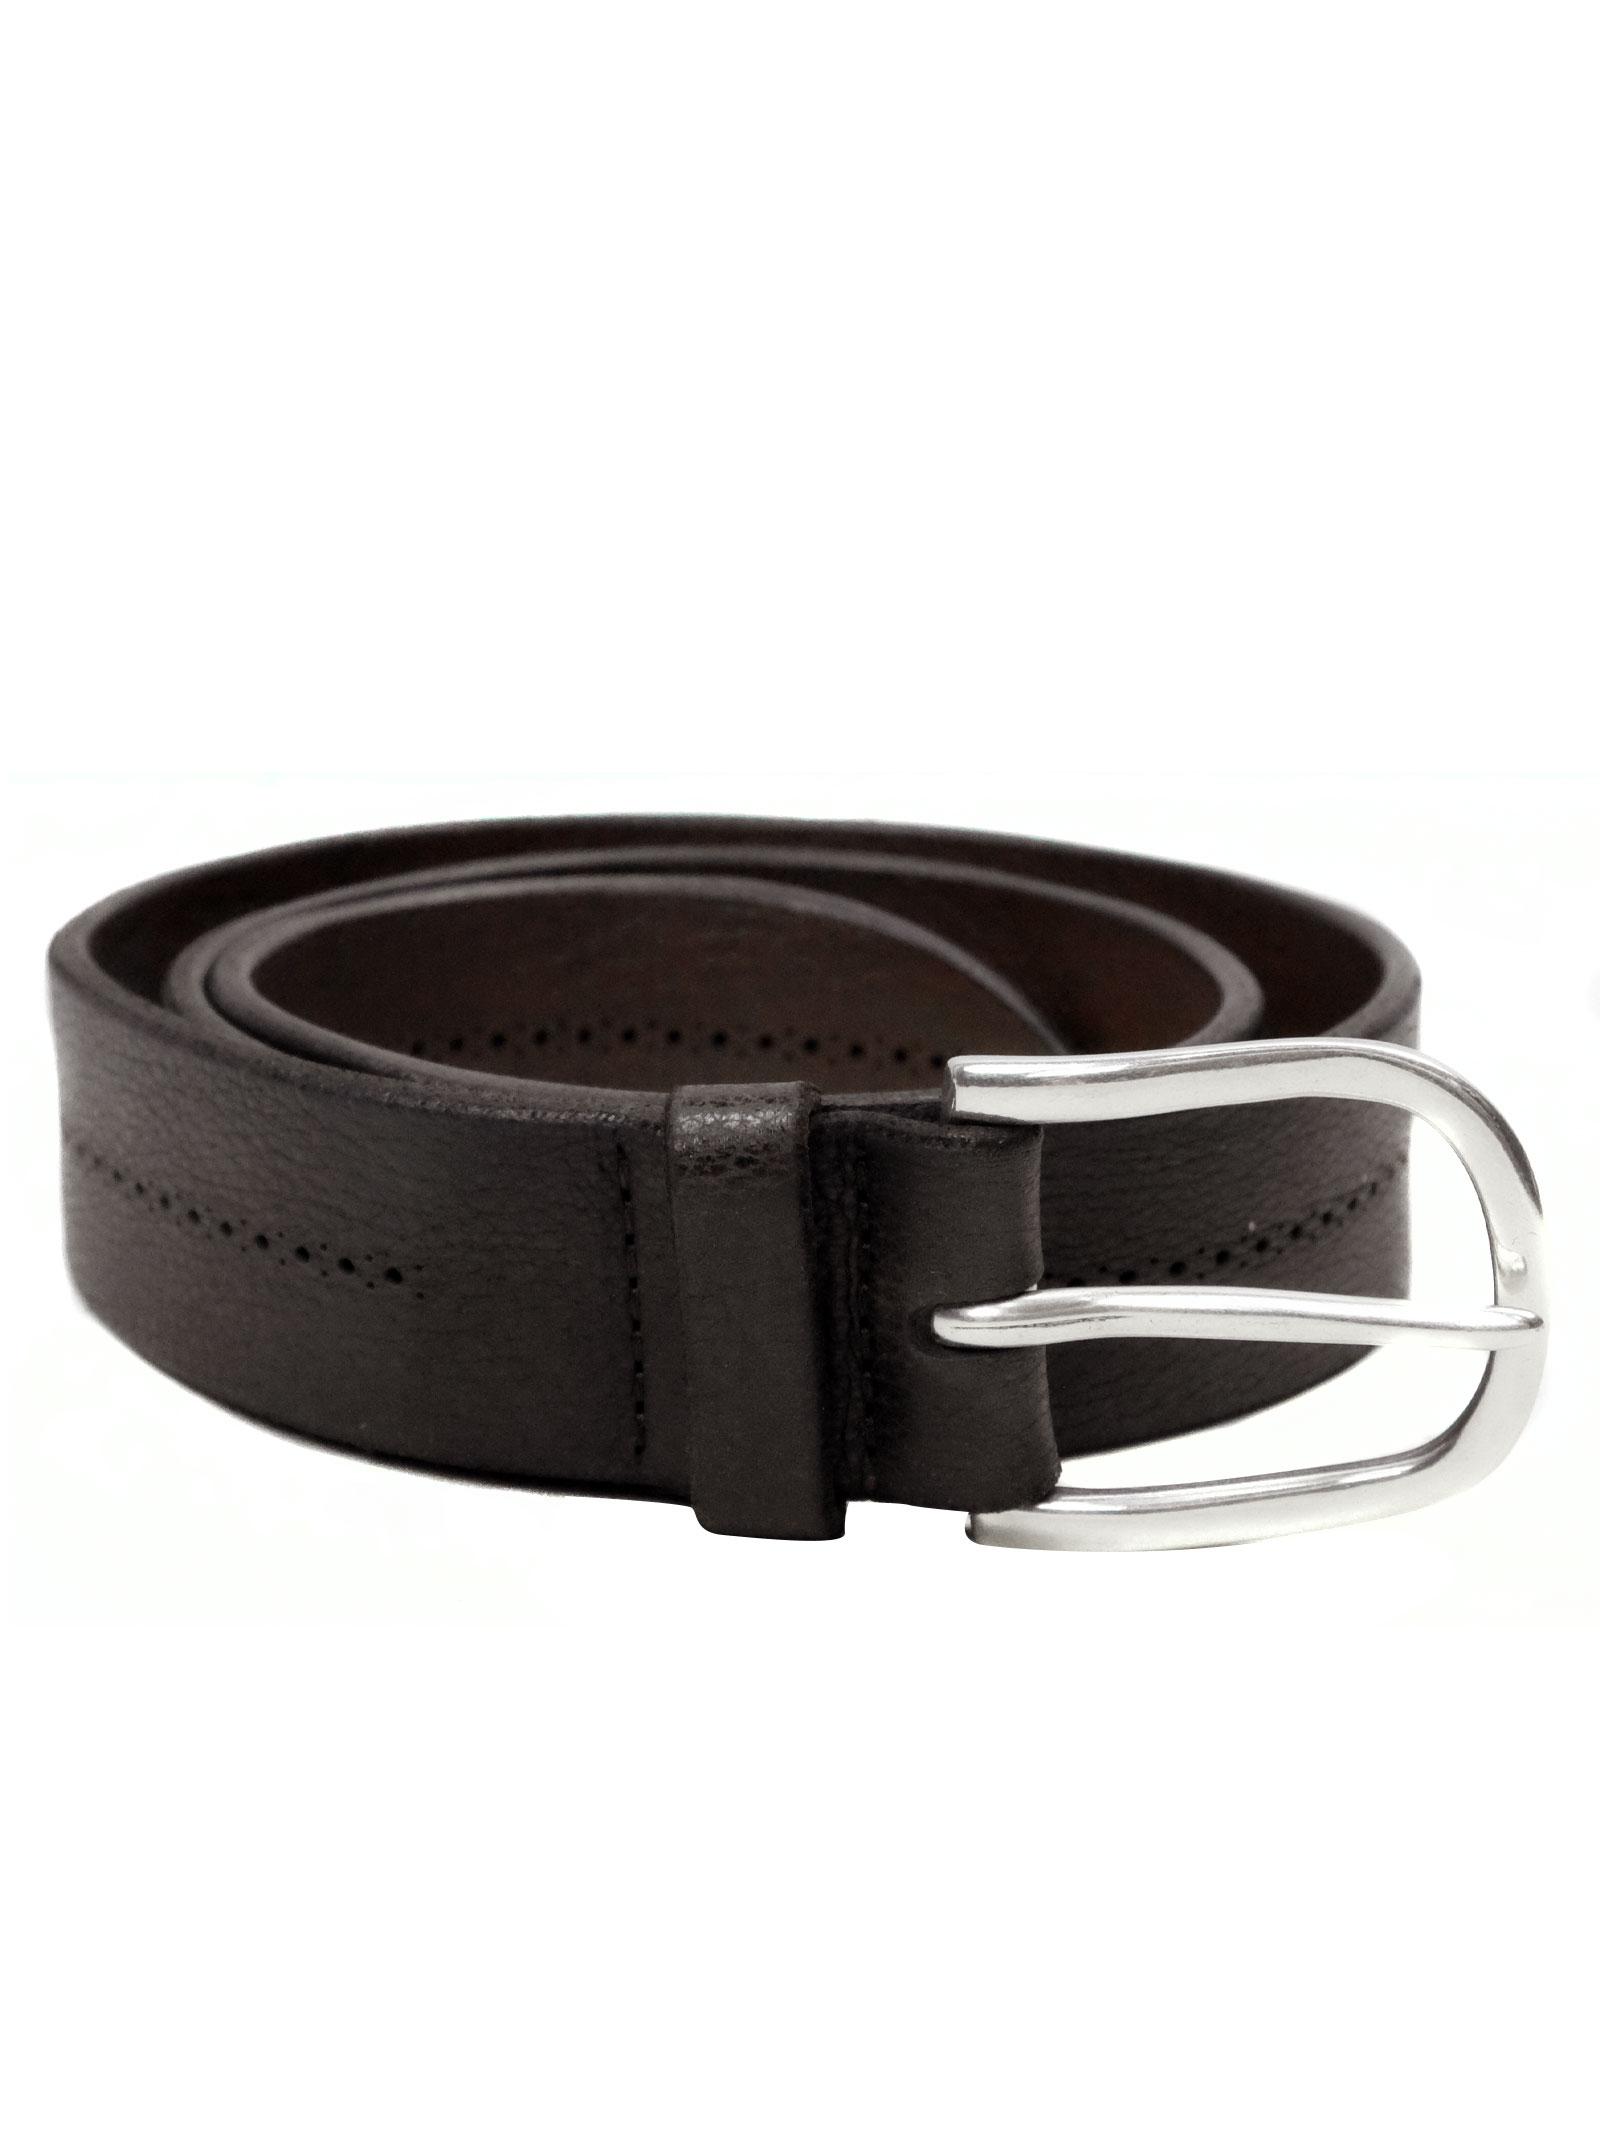 casual belt ORCIANI | Belts | 7942MORO